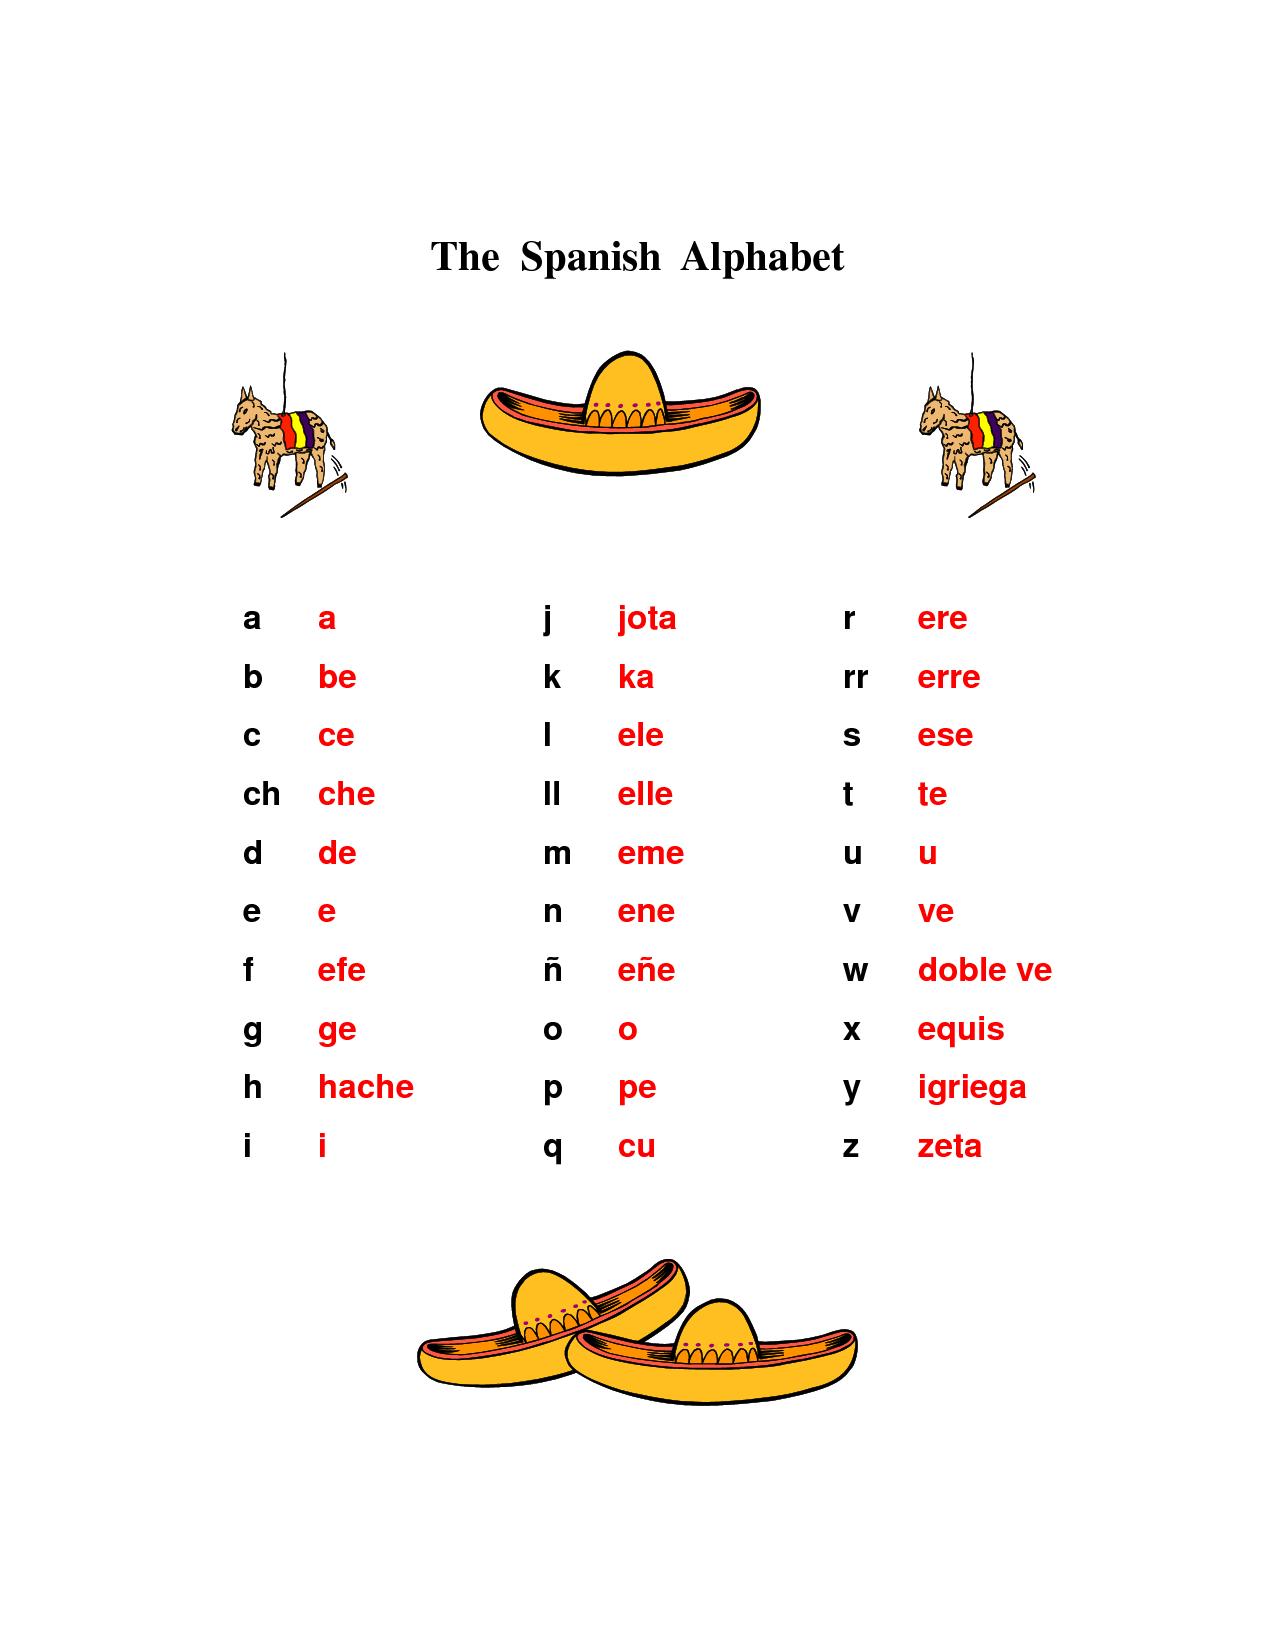 Letters Of The Alphabet In Spanish Spanish Alphabet Alphabet Teach Me Spanish [ 1650 x 1275 Pixel ]